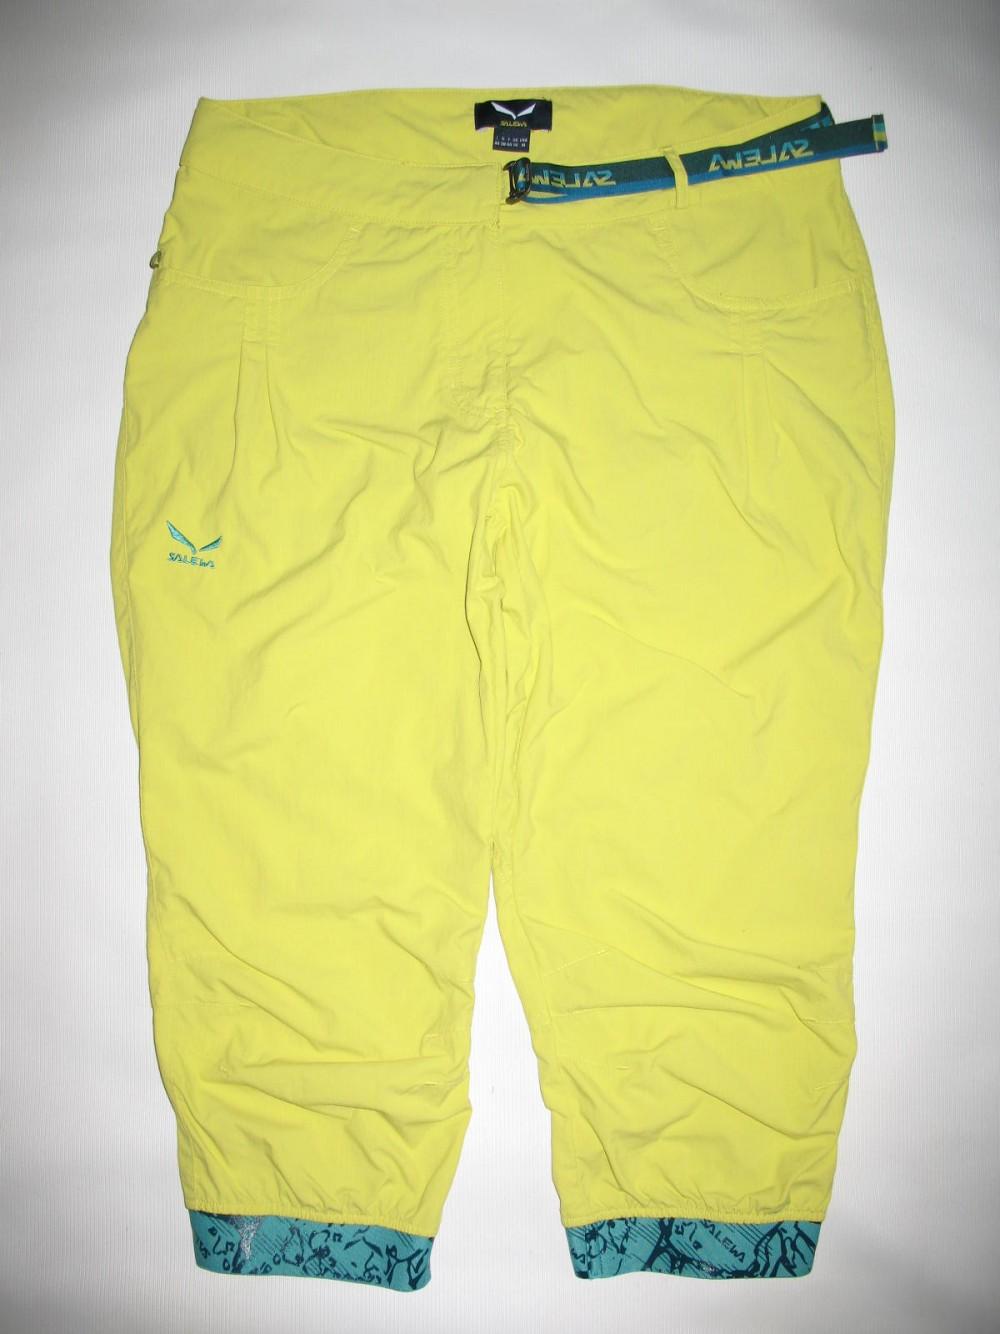 Штаны SALEWA rhytmo dry 3/4 pant lady (размер М) - 1